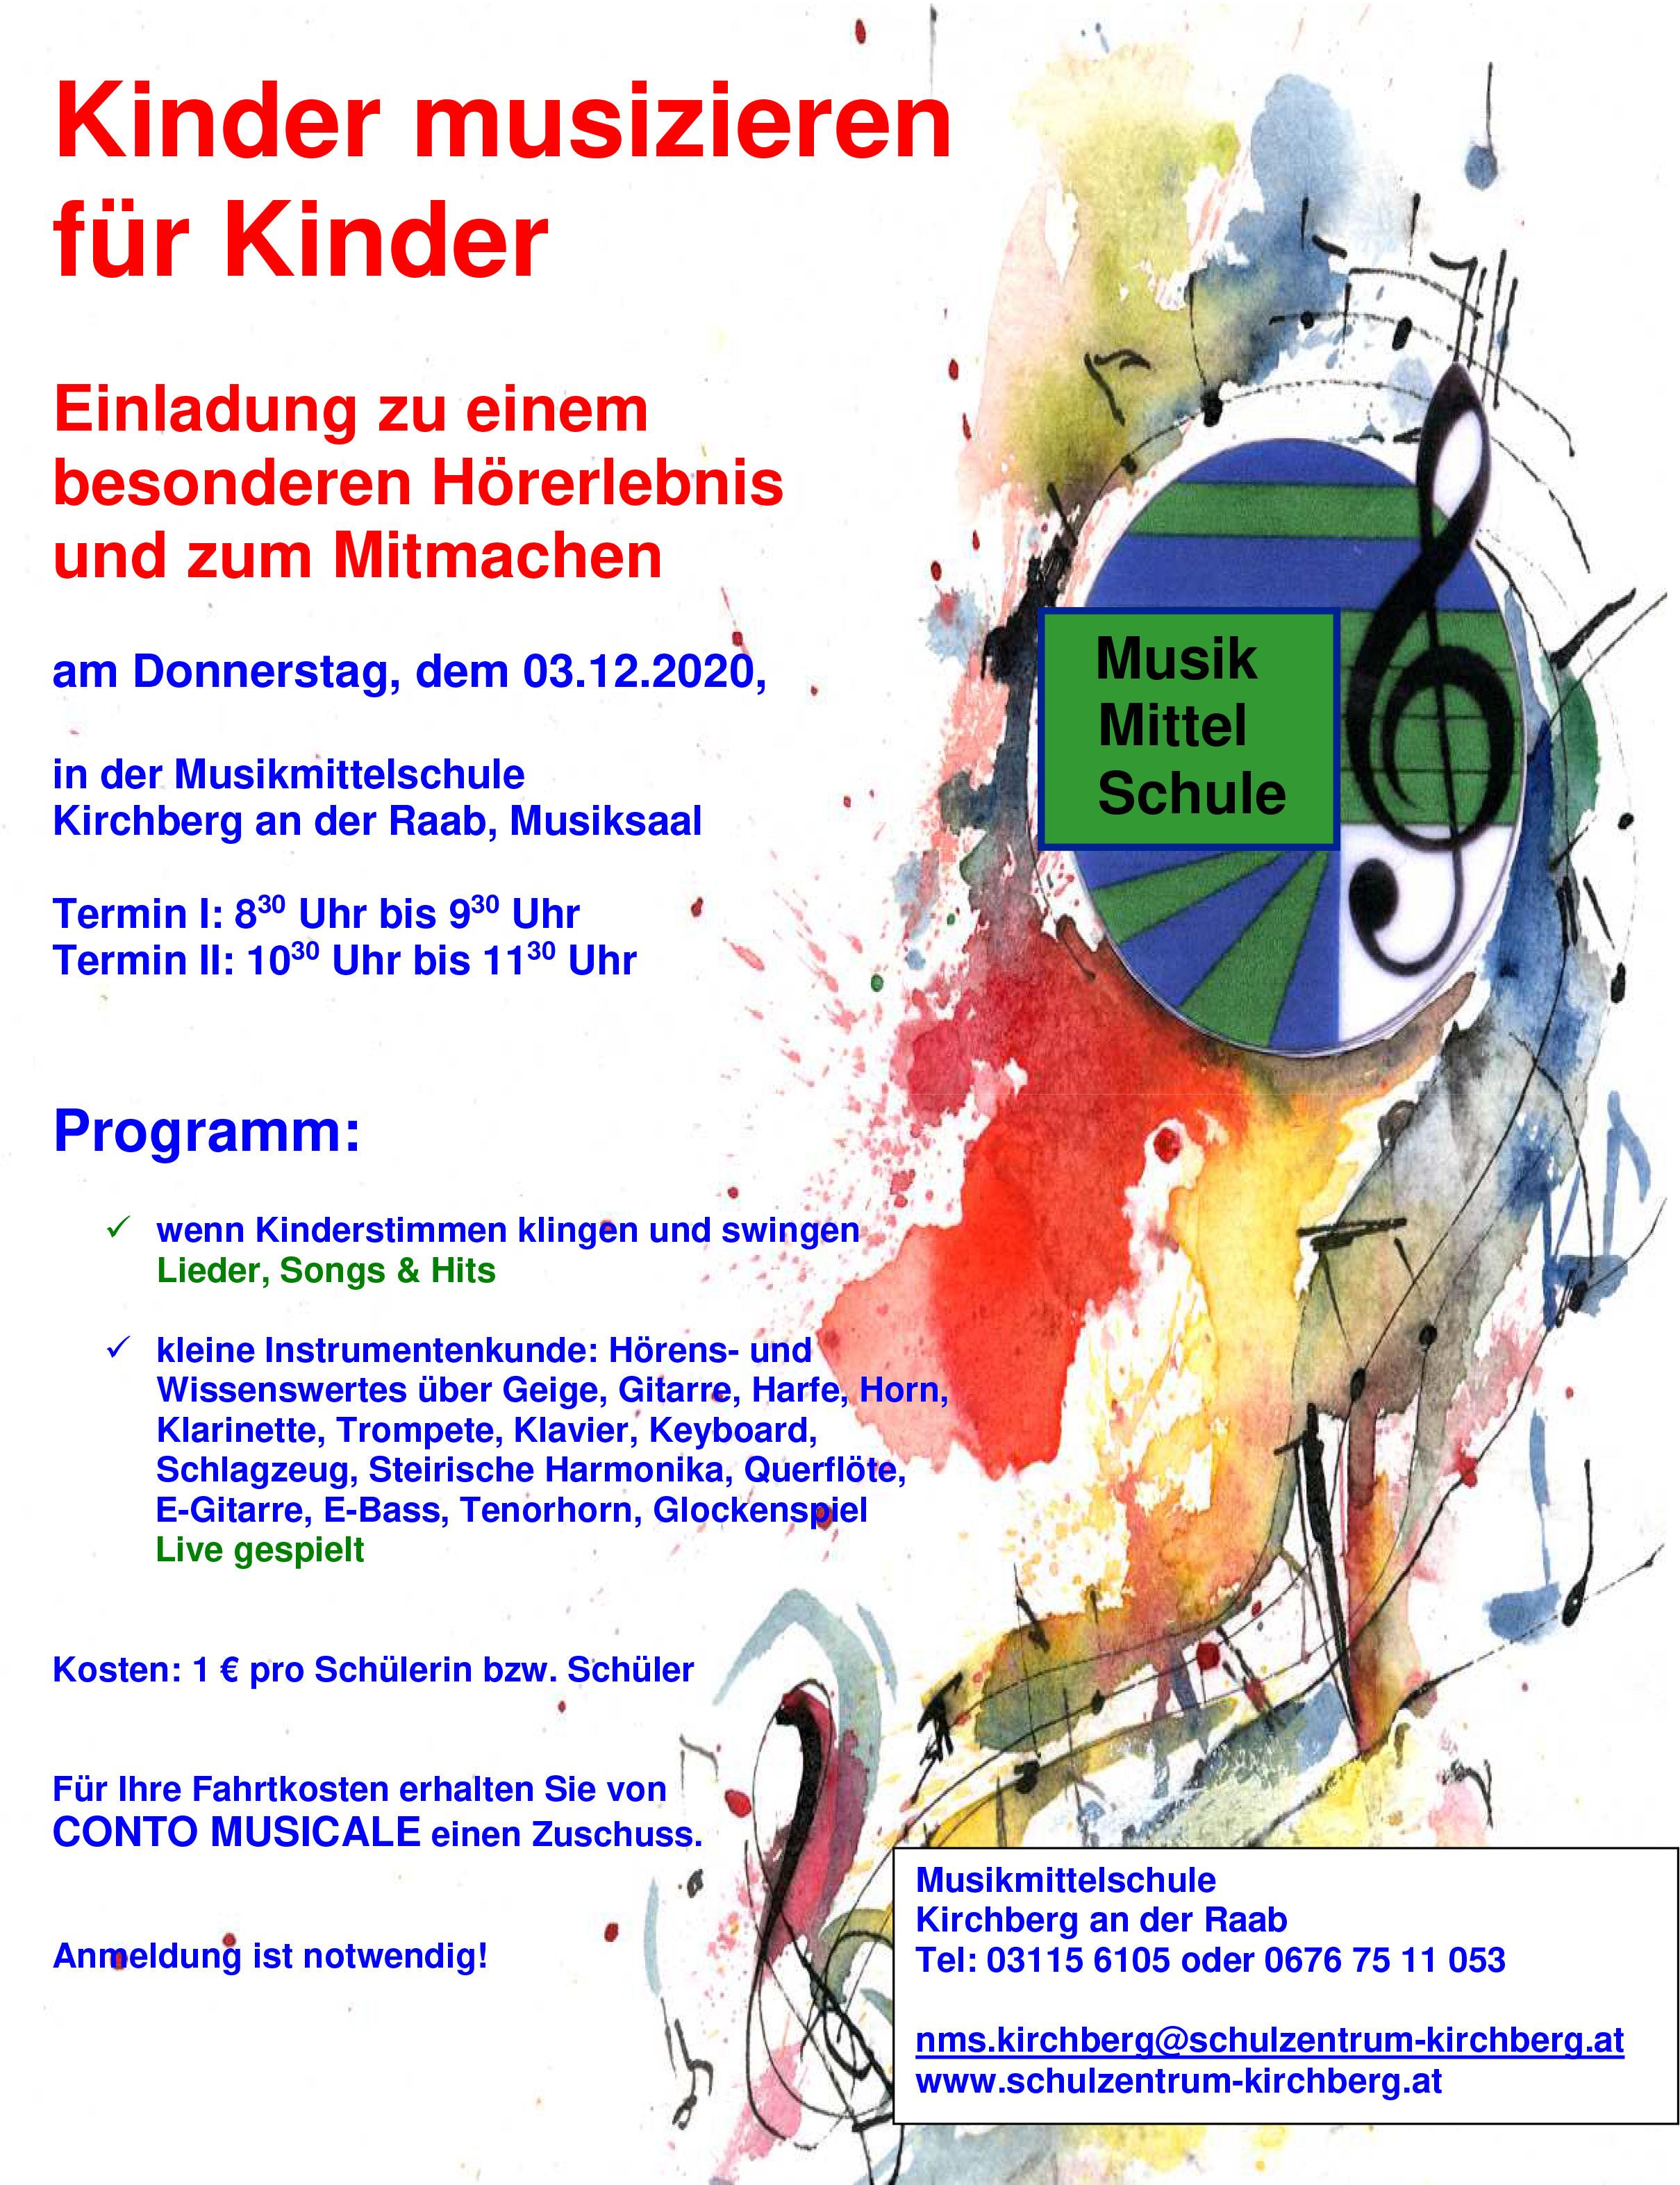 Einladung-Conto-musicale-2020